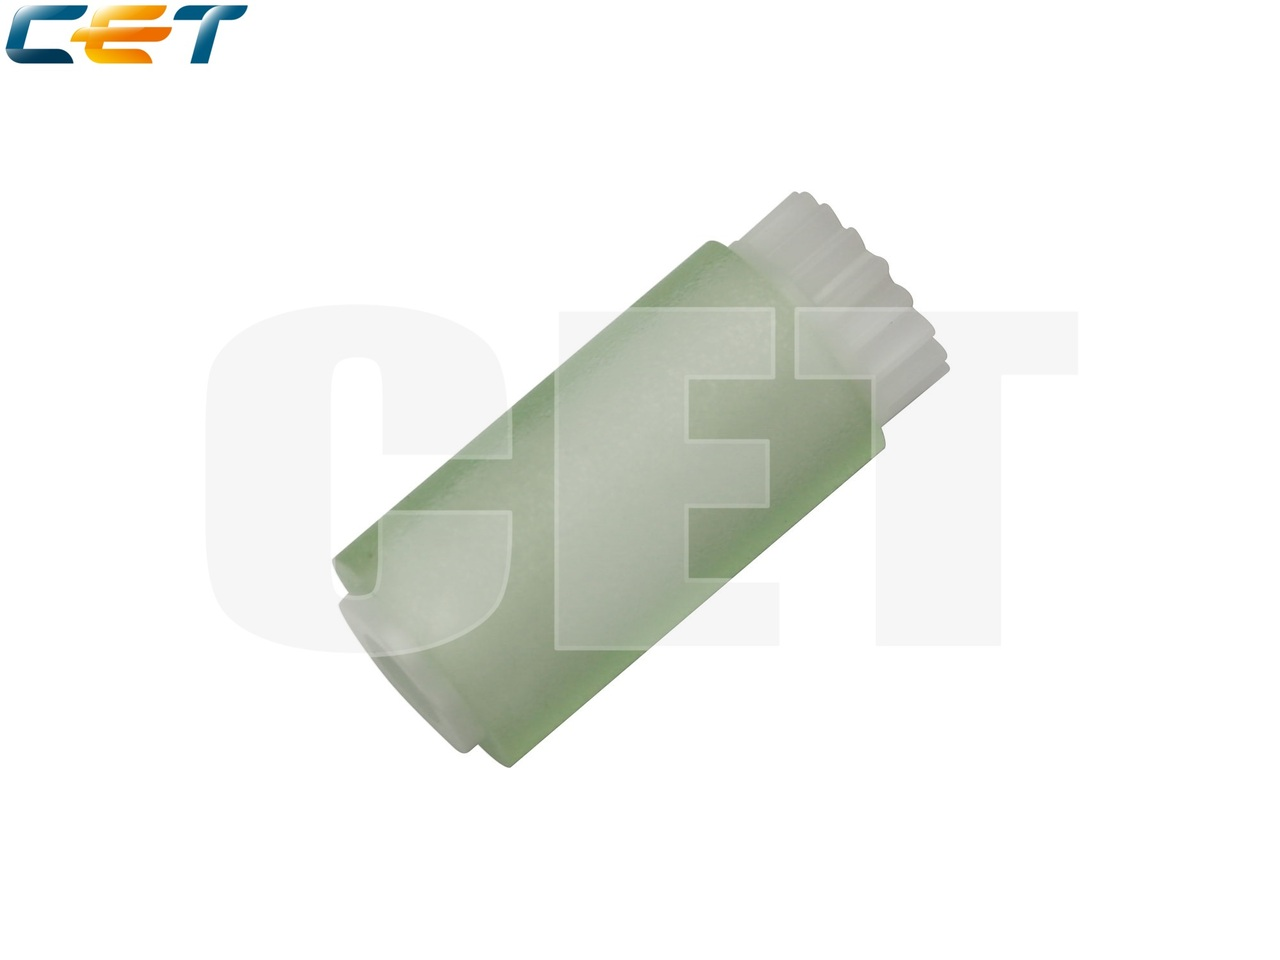 Ролик подхвата (полиуретан) FB6-3405-000 для CANON iRADVANCE 4025/4035/4045/4051/4225/4235/4245/4251 (CET),CET6558